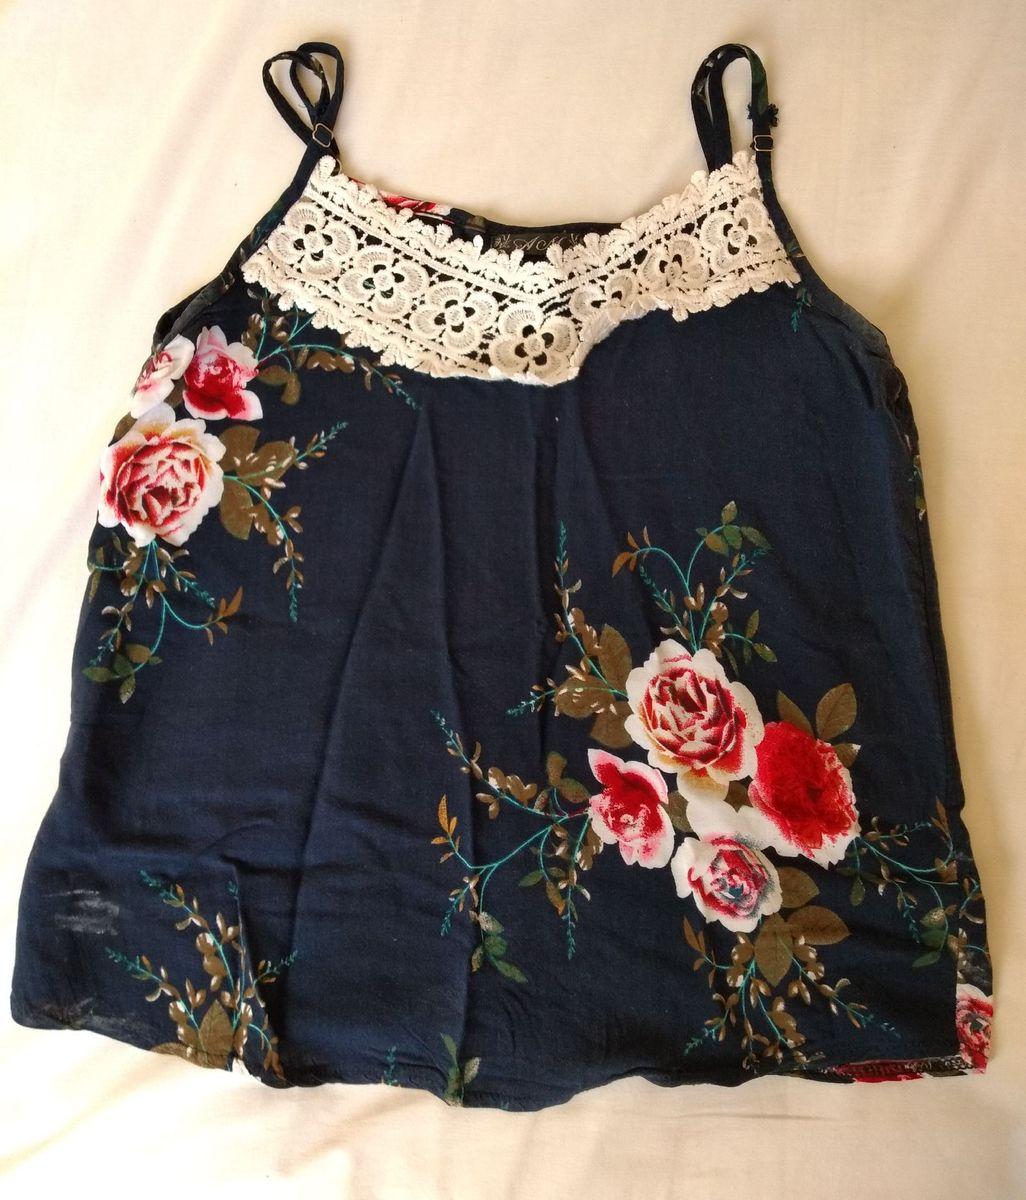 blusinha regata - blusas sem marca